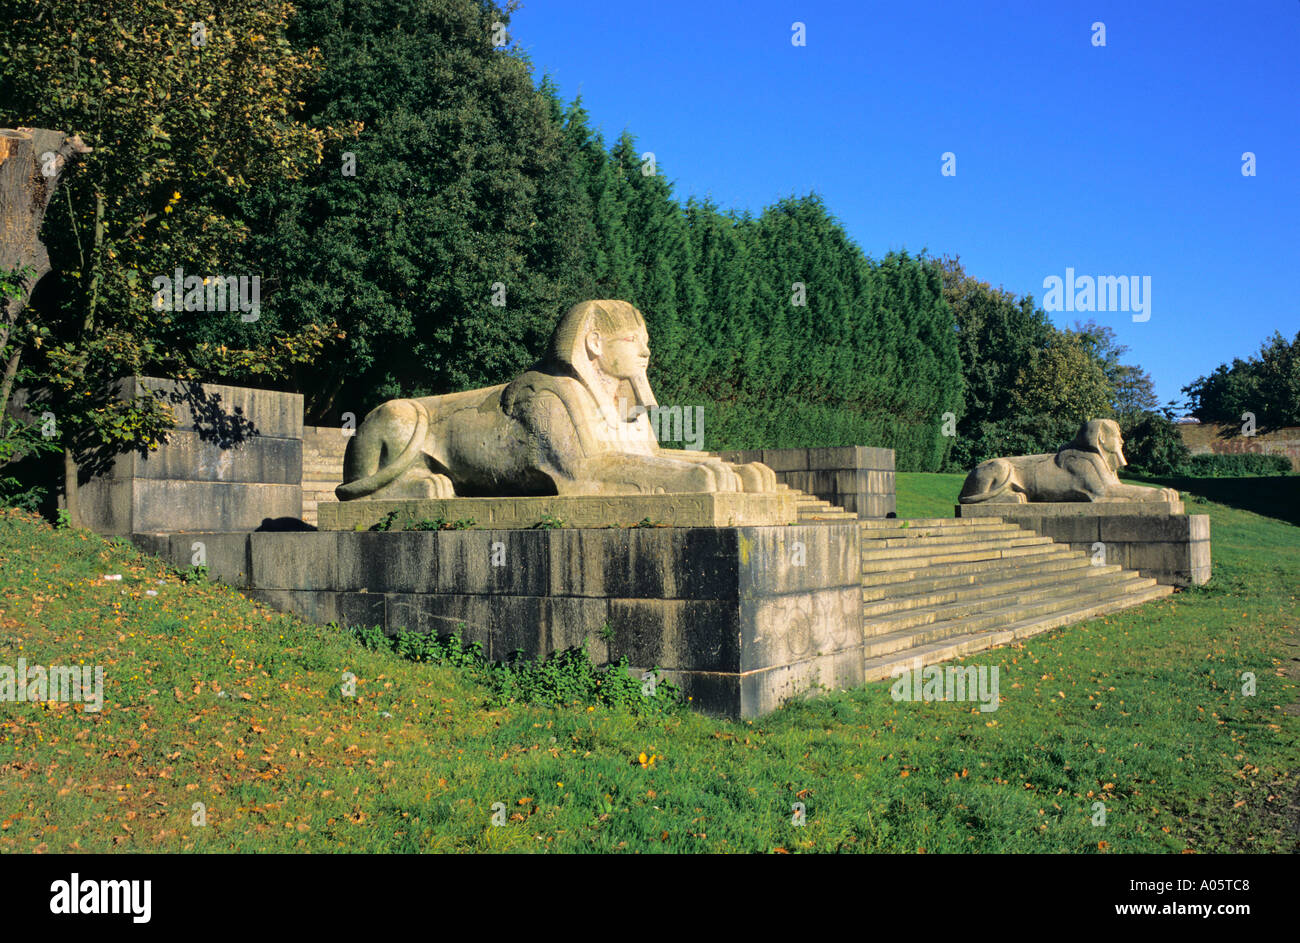 Crystal Palace original steps and sphinx Sydenham London UK - Stock Image